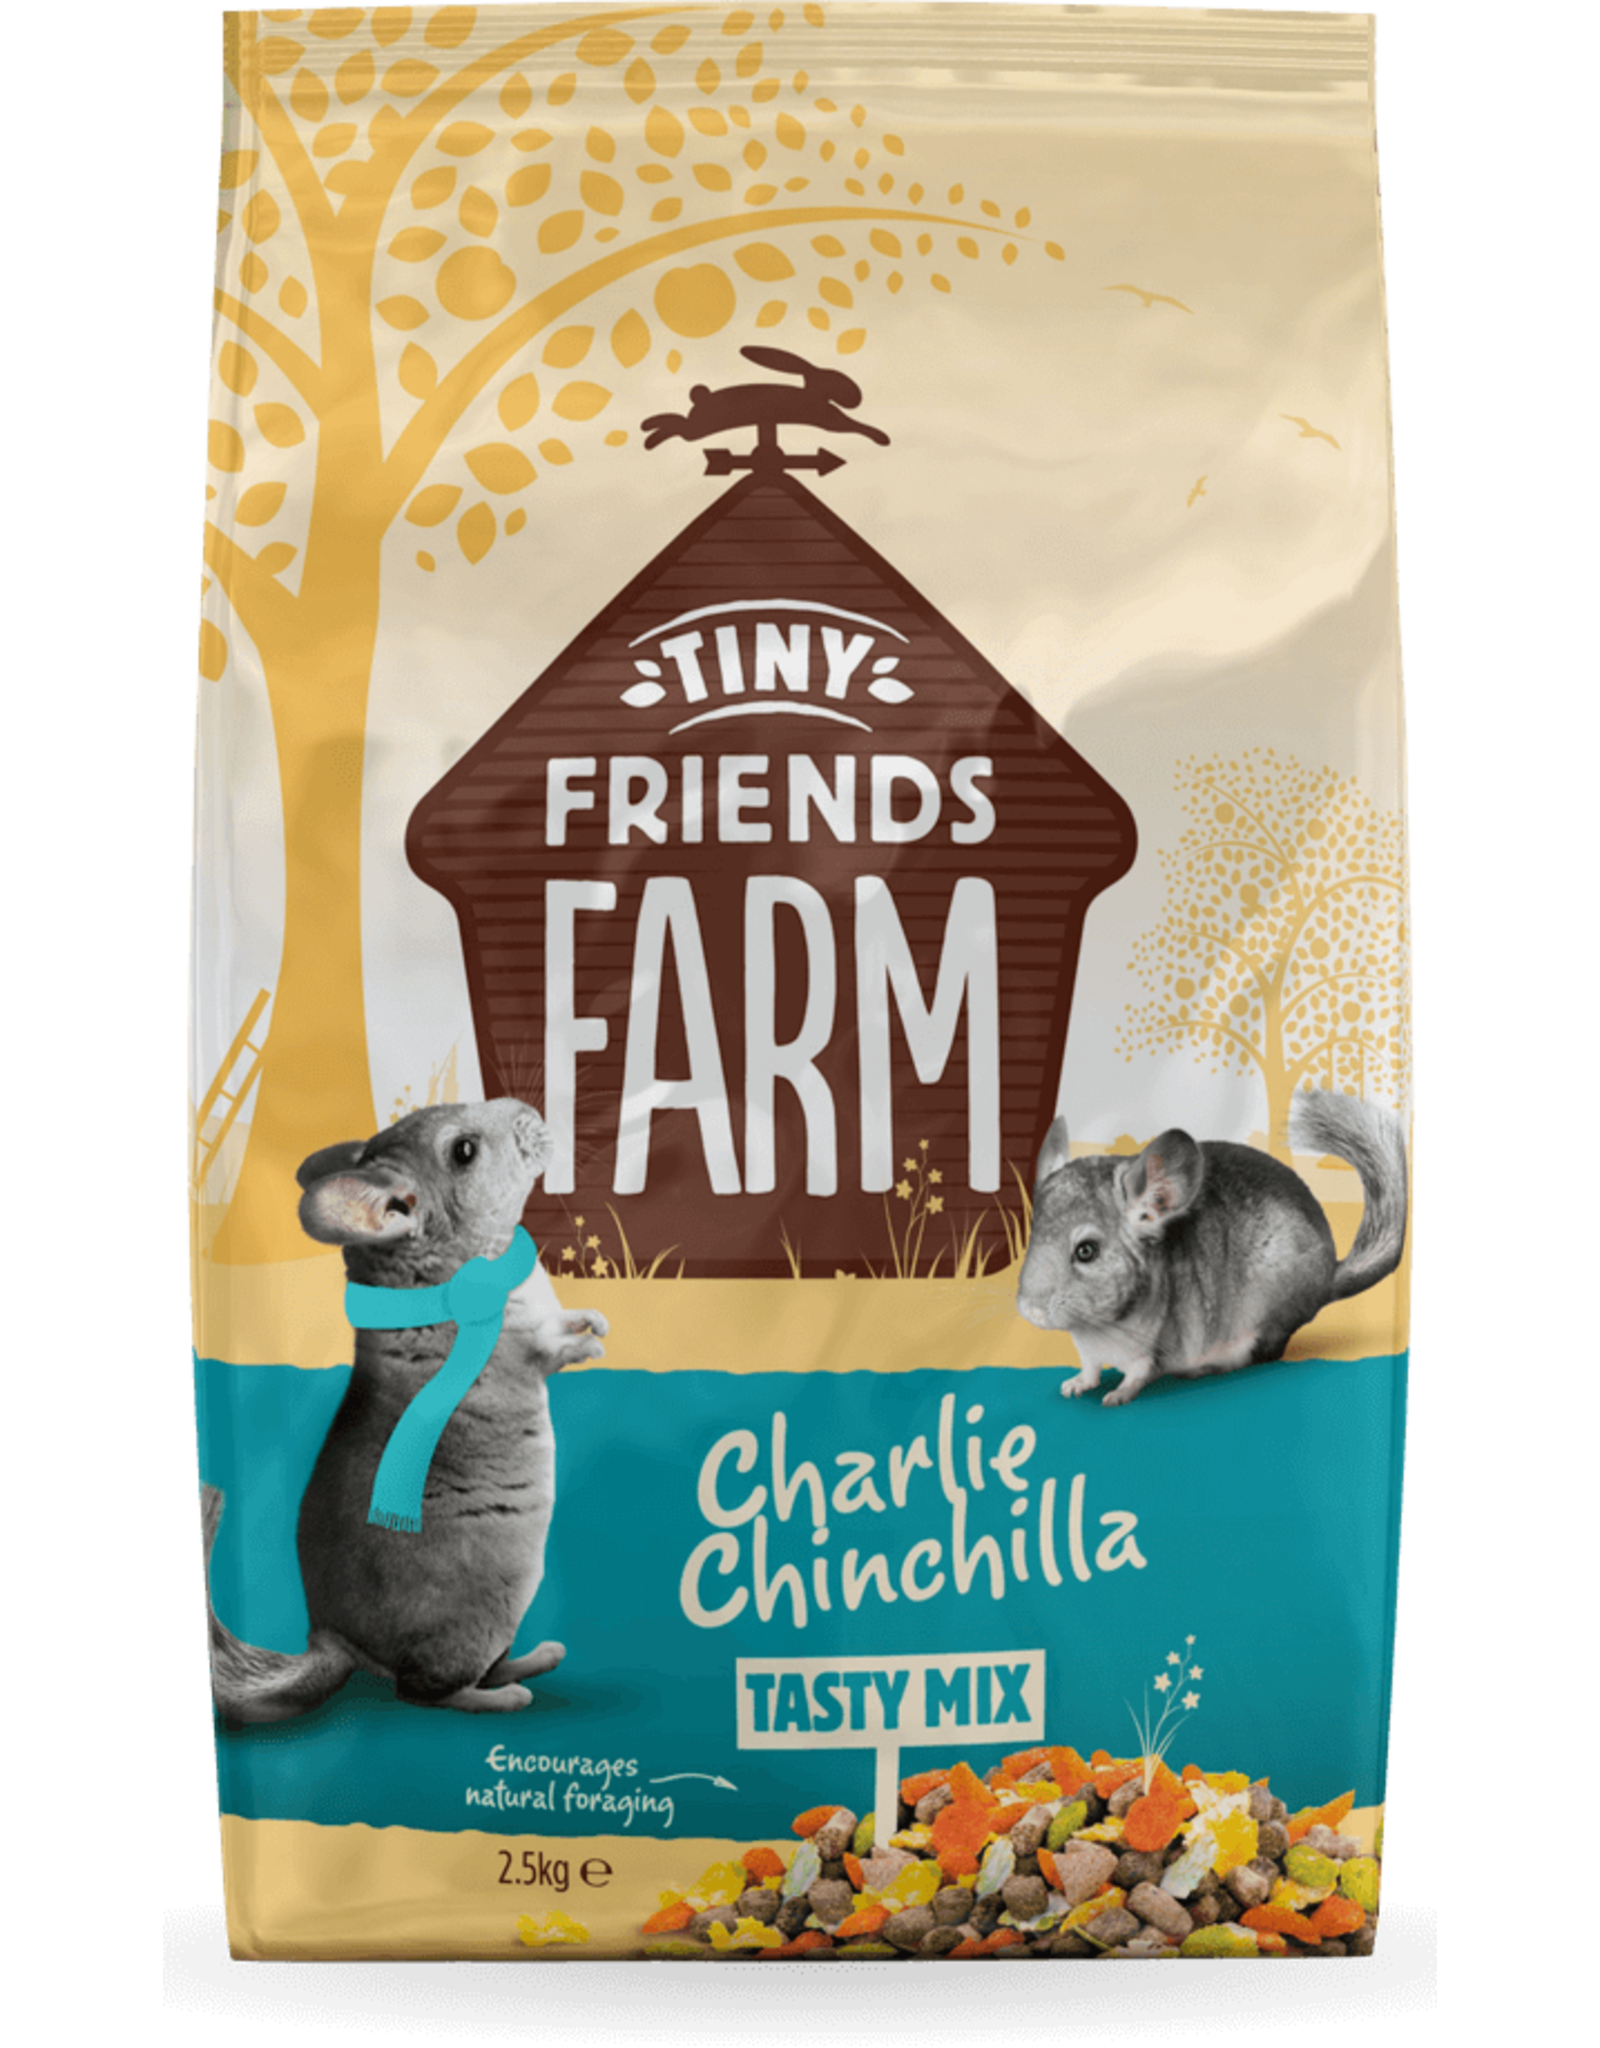 Supreme Pet Foods TINY FRIENDS FARM Charlie Chinchilla Tasty Mix 907g